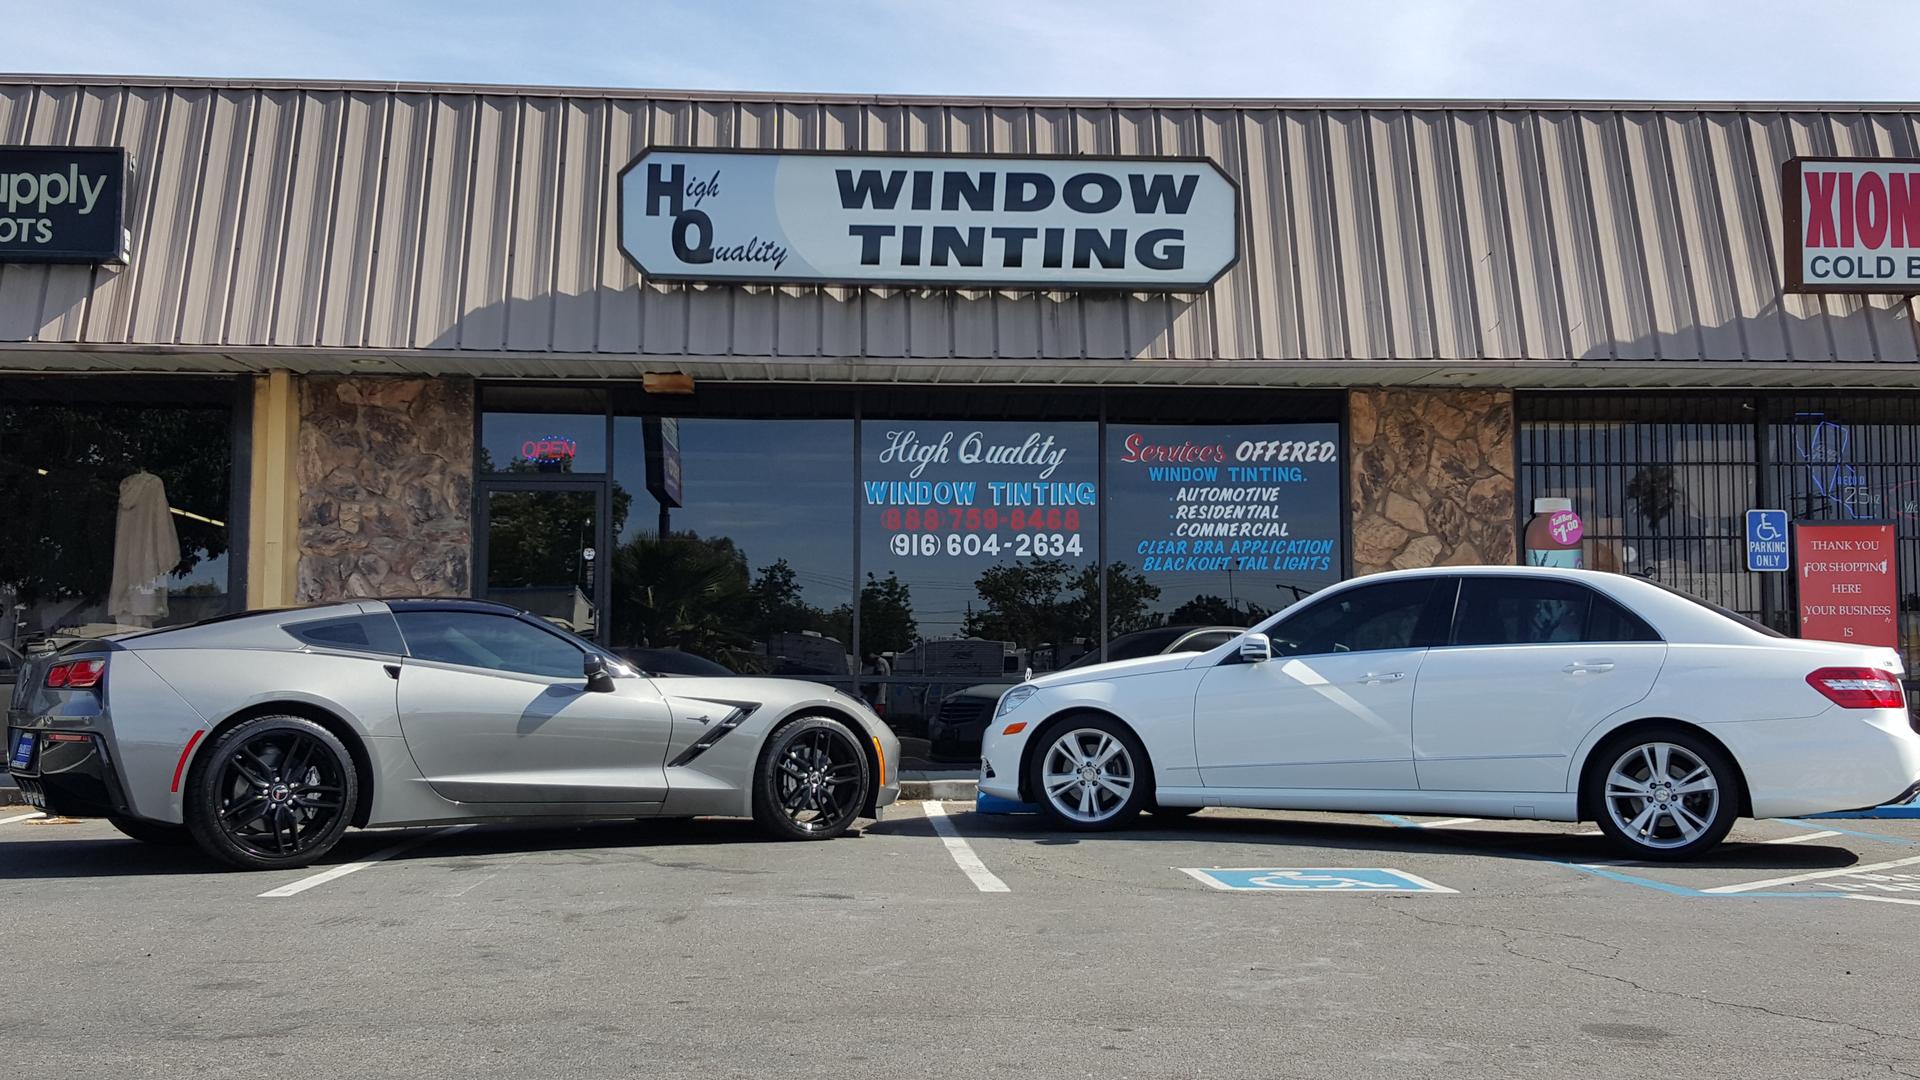 Window Tinting Sacramento >> Hq Window Tinting